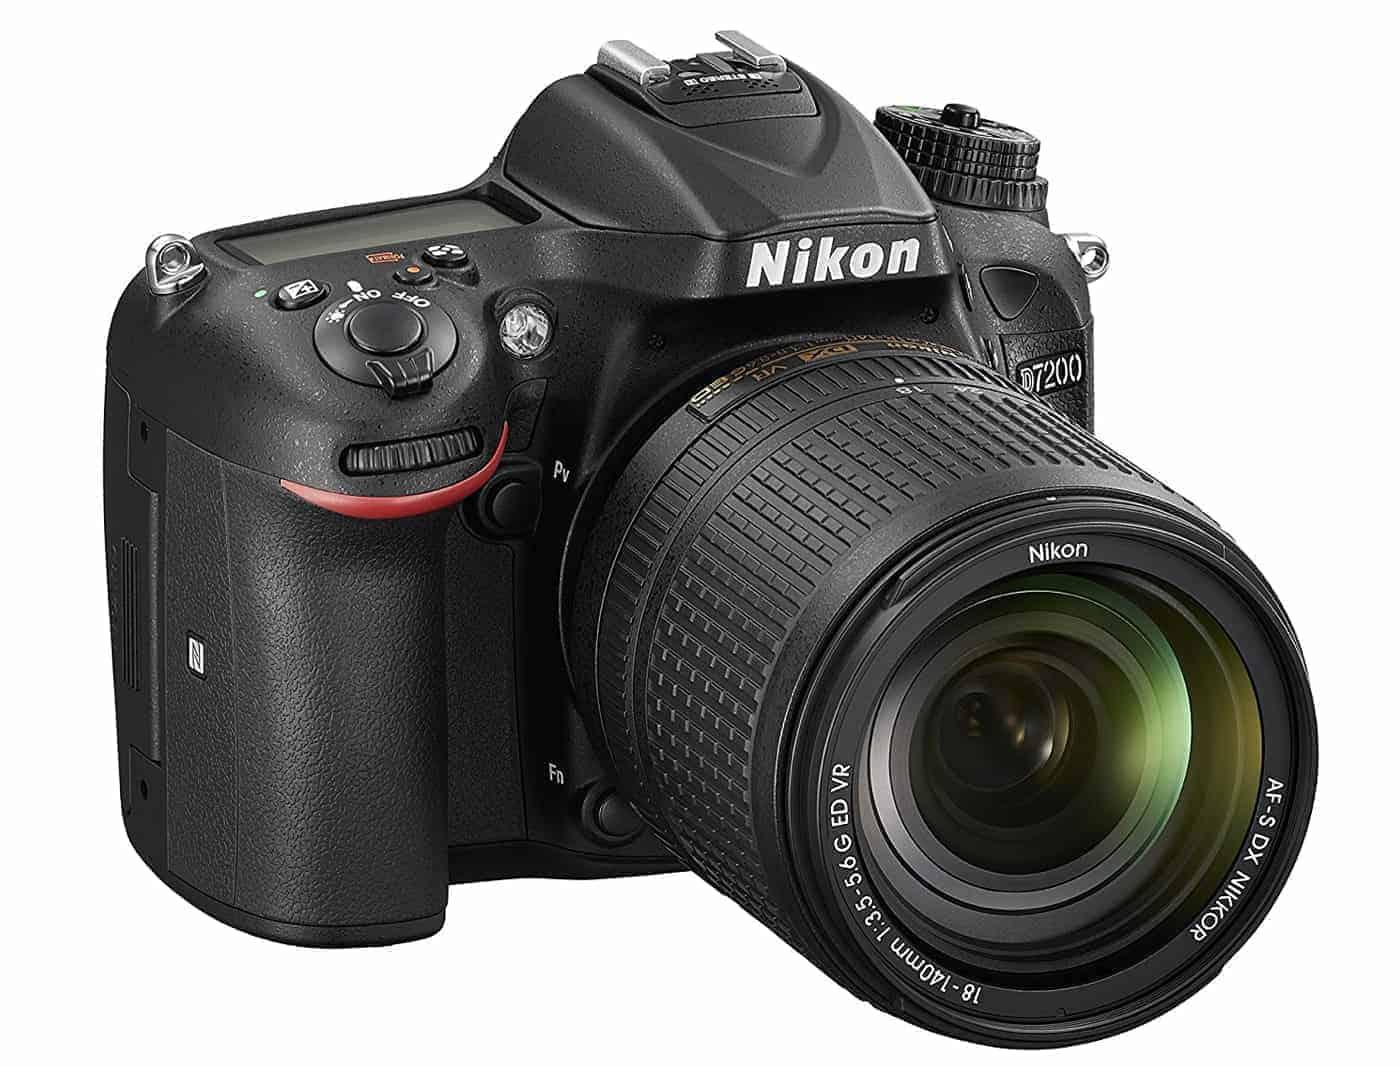 Best Nikon DSLR under $1,000 #1 Nikon D7200 DX-format DSLR Body (Black)